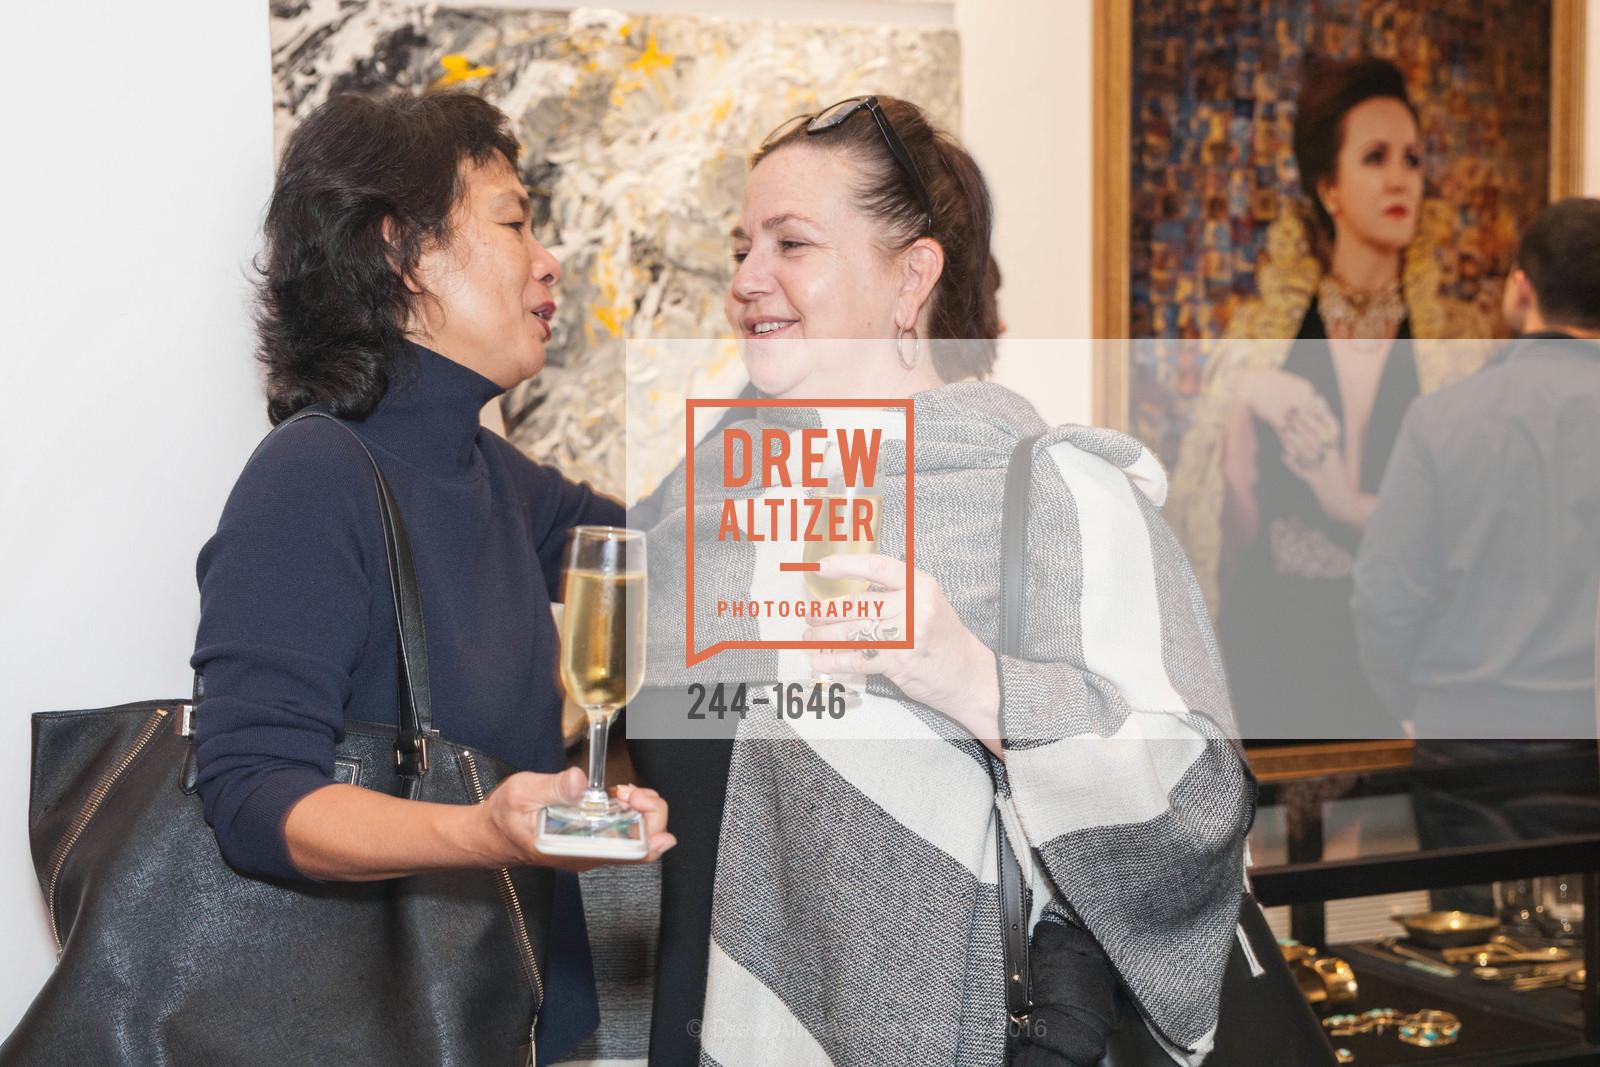 Nancy Lam, Deniece Duscheone, Adeeni Design Galerie Opening, Adeeni Design Group. 664 Post Street, December 8th, 2016